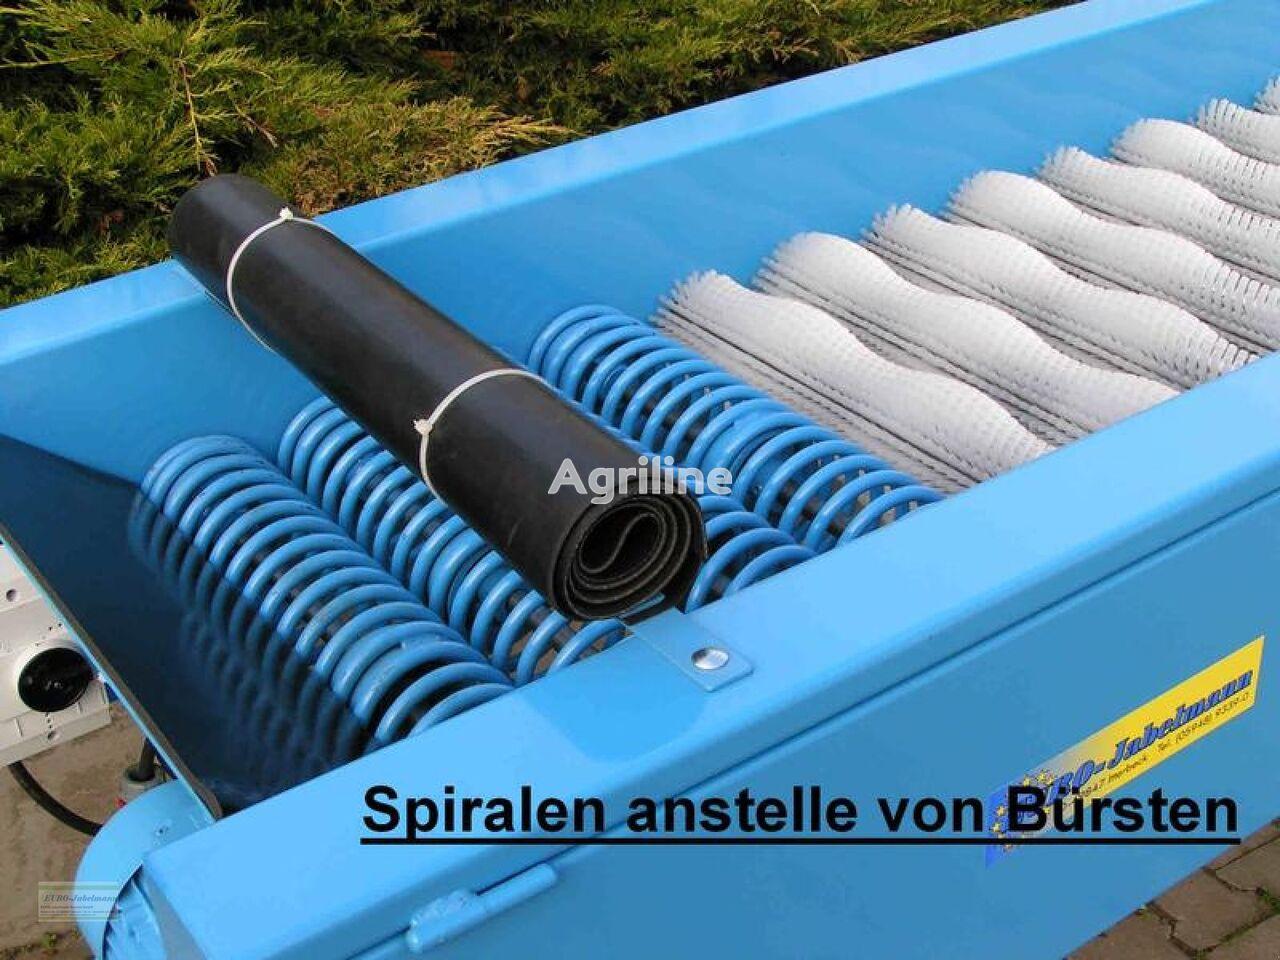 nový myčka zeleniny EURO-Jabelmann Bürstenmaschine, NEU, 11 Bürsten + 3 Spiralen, 550 mm breit